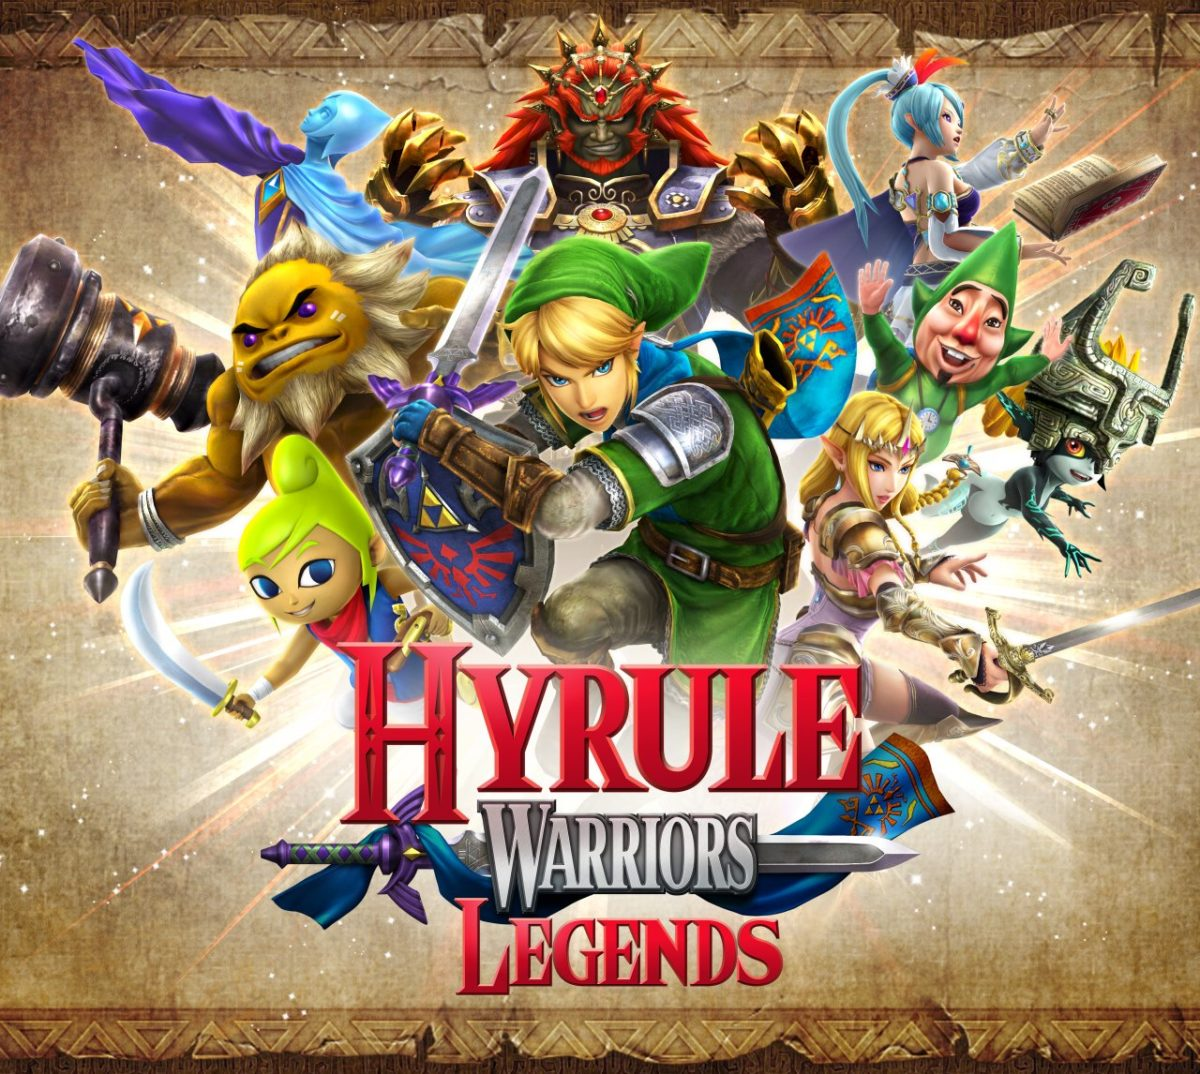 Hyrule Warriors Legends – Impressioni a caldo sulla demo